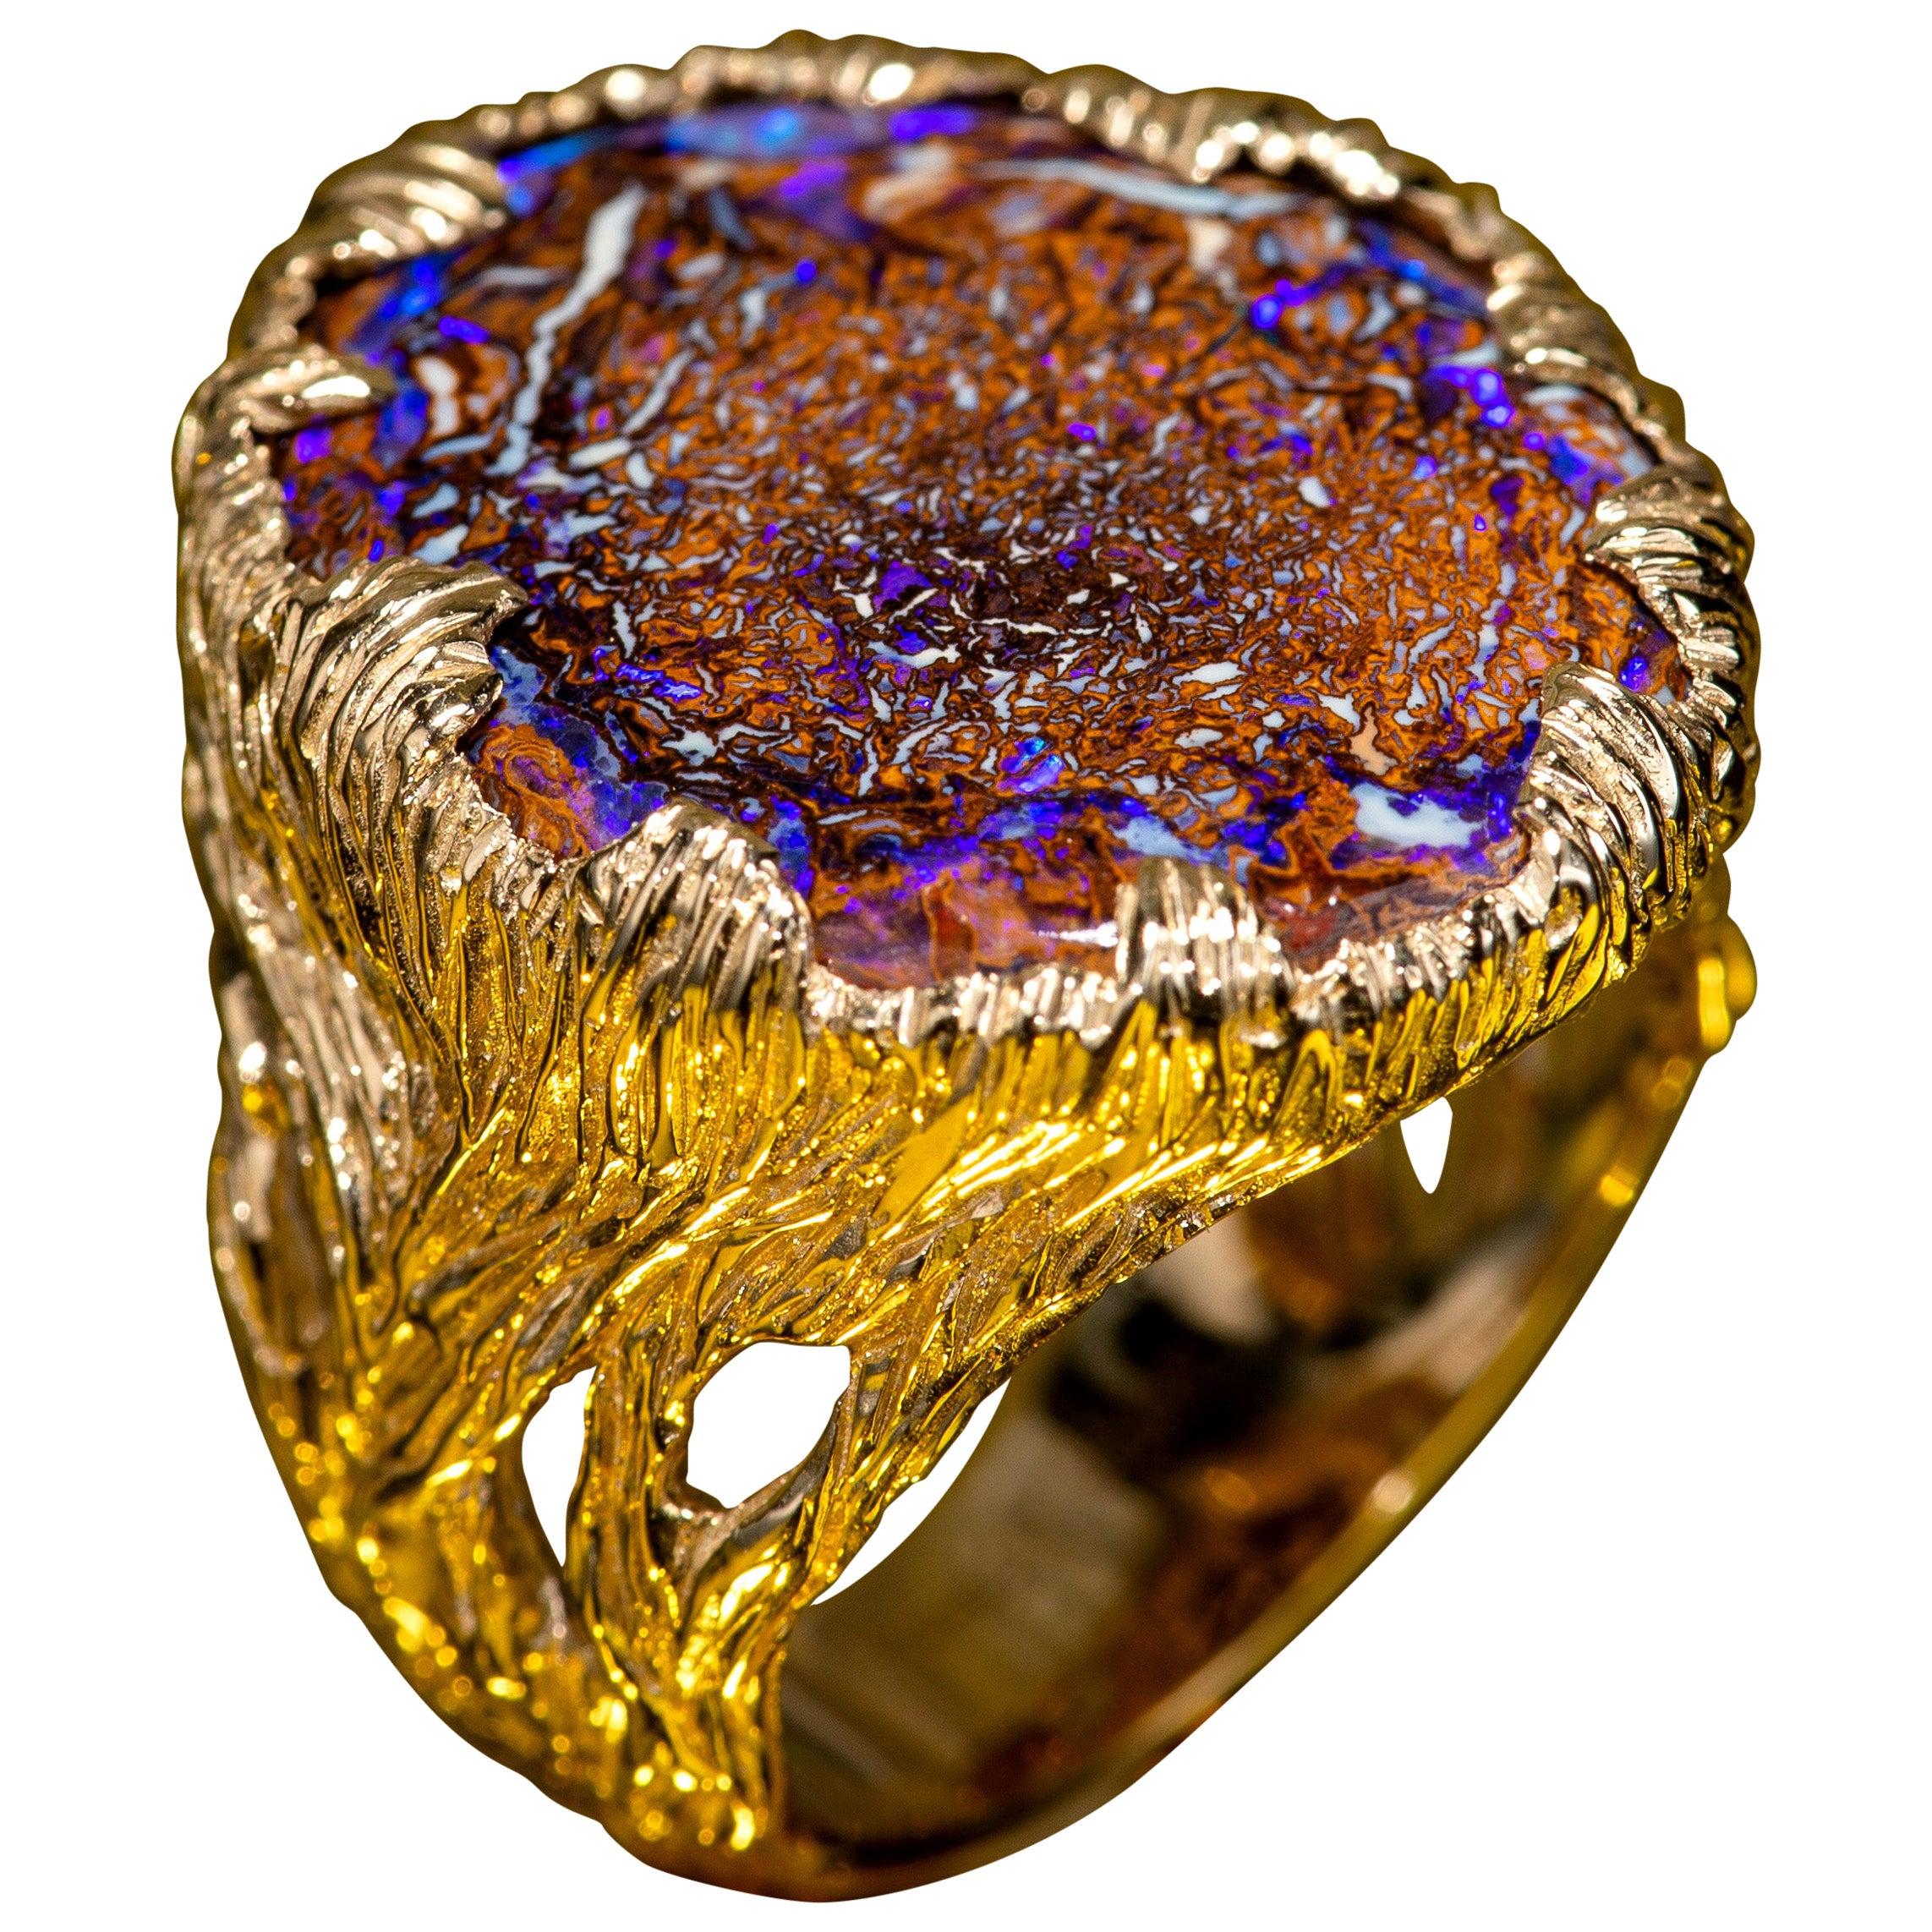 Australian Boulder Opal Yellow Gold Ring Fine Unisex Jewelry Christmas gift him